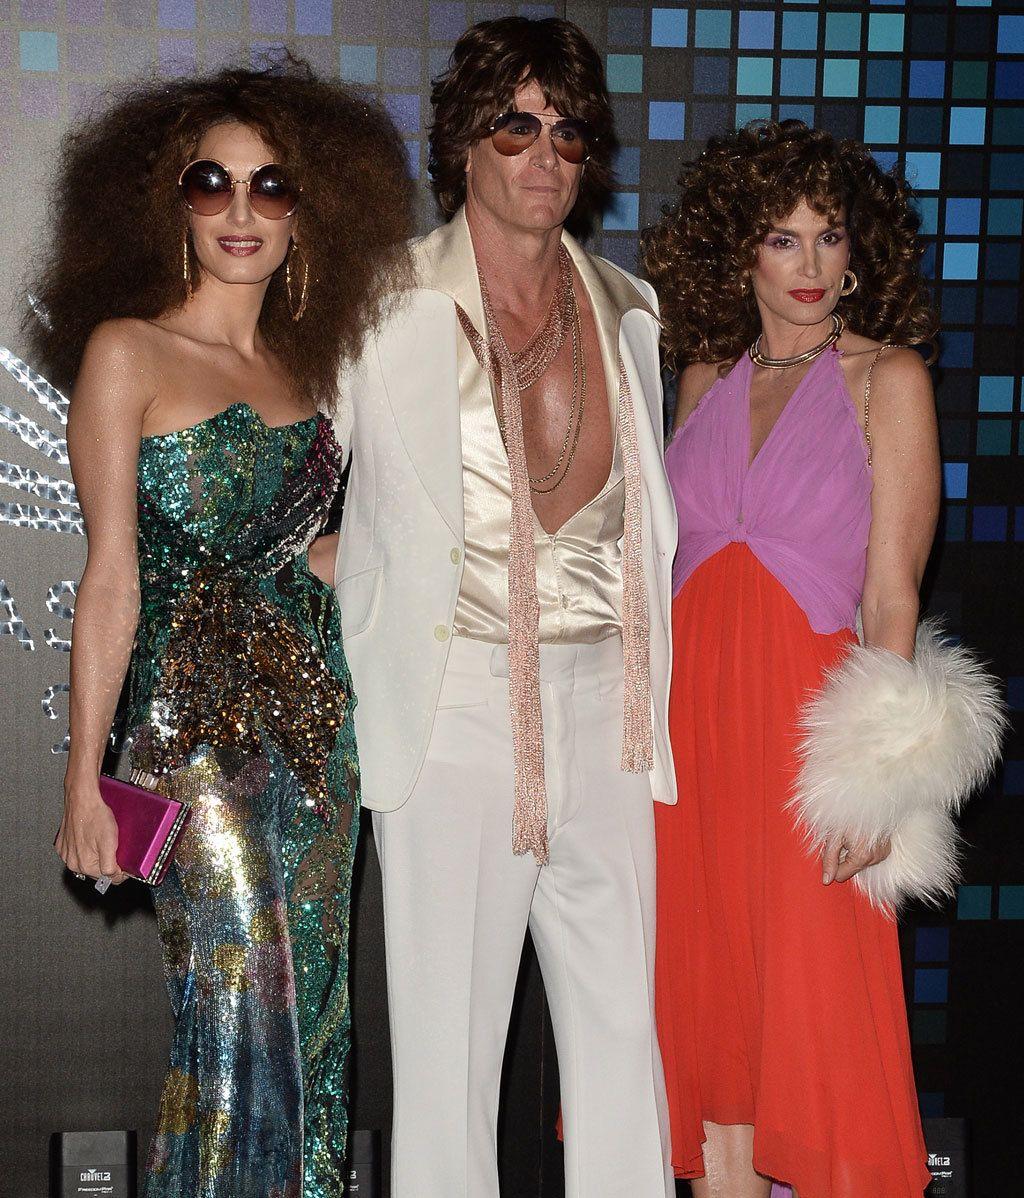 Frozen, Juno, Michael Jackson o cadáveres...así han sido los disfraces favoritos de 'vips'  para Hallowen